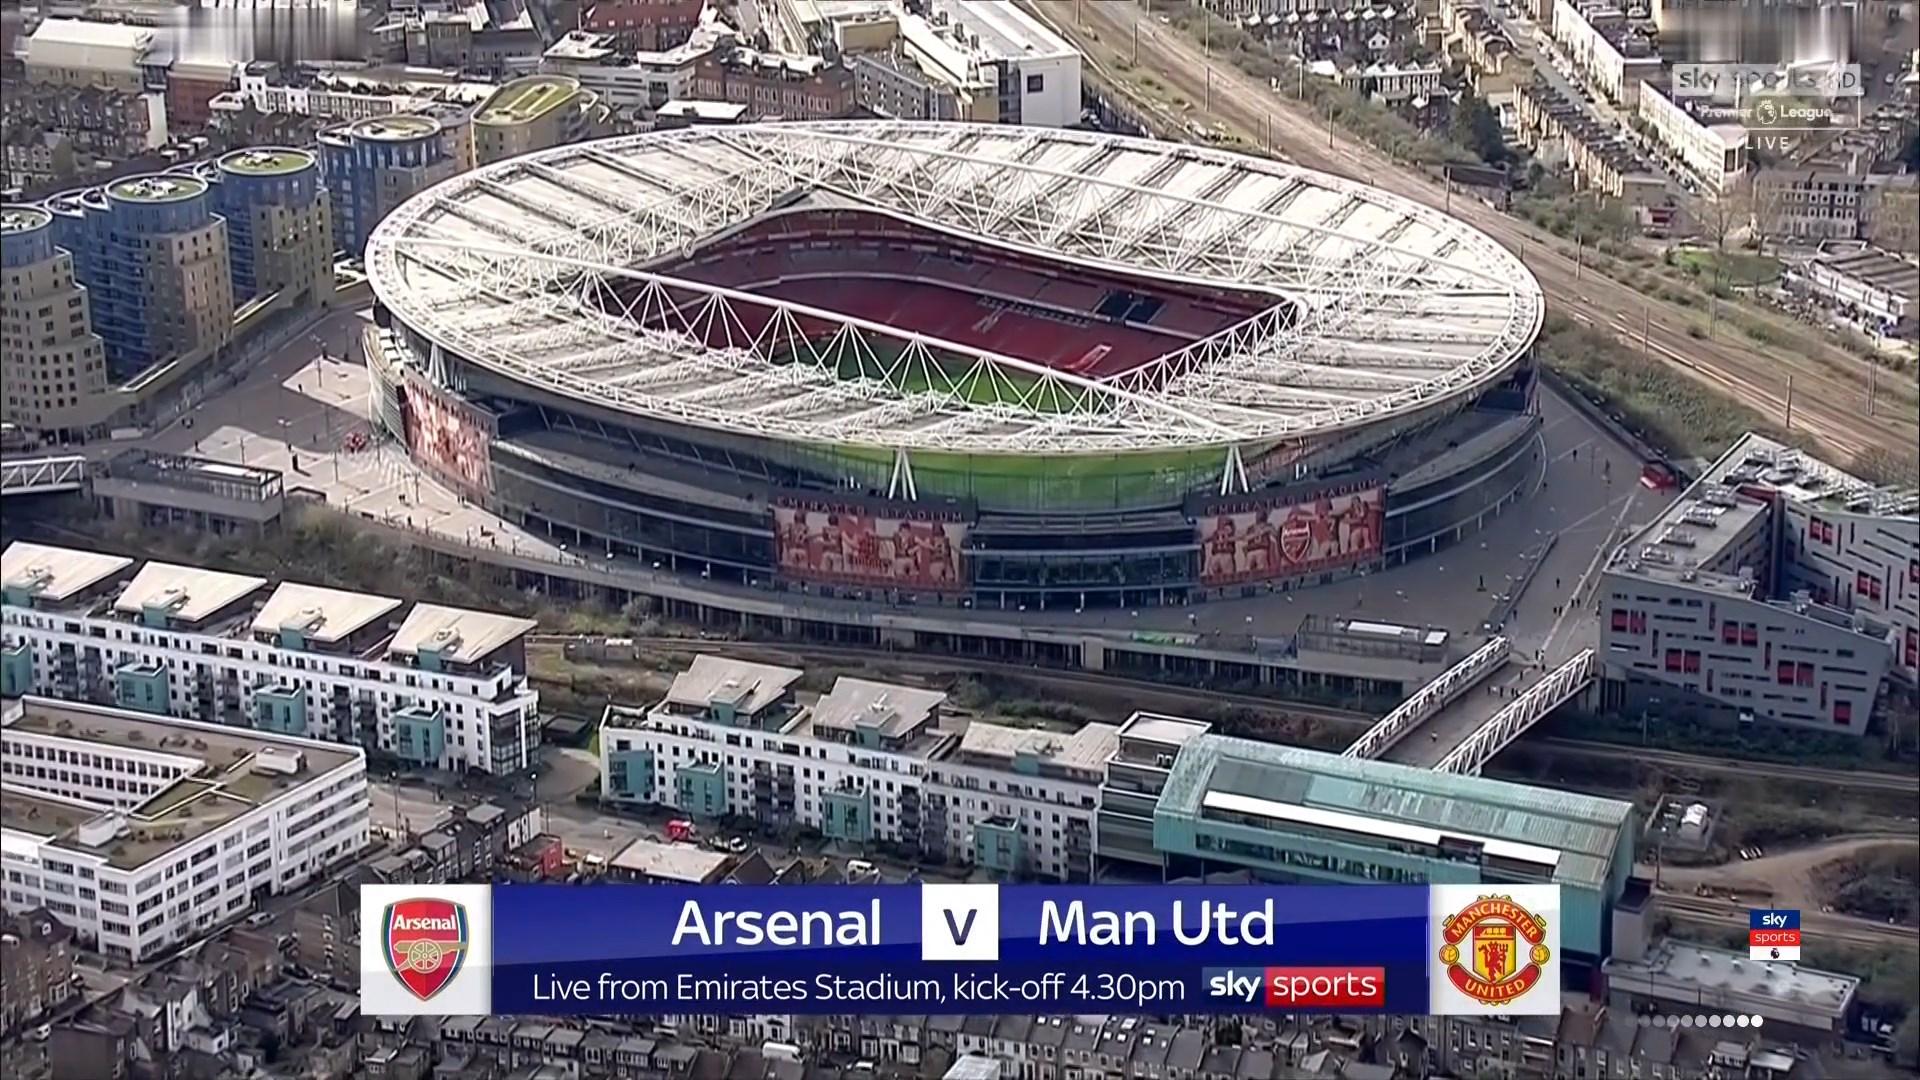 Xem lại: Arsenal vs Manchester United